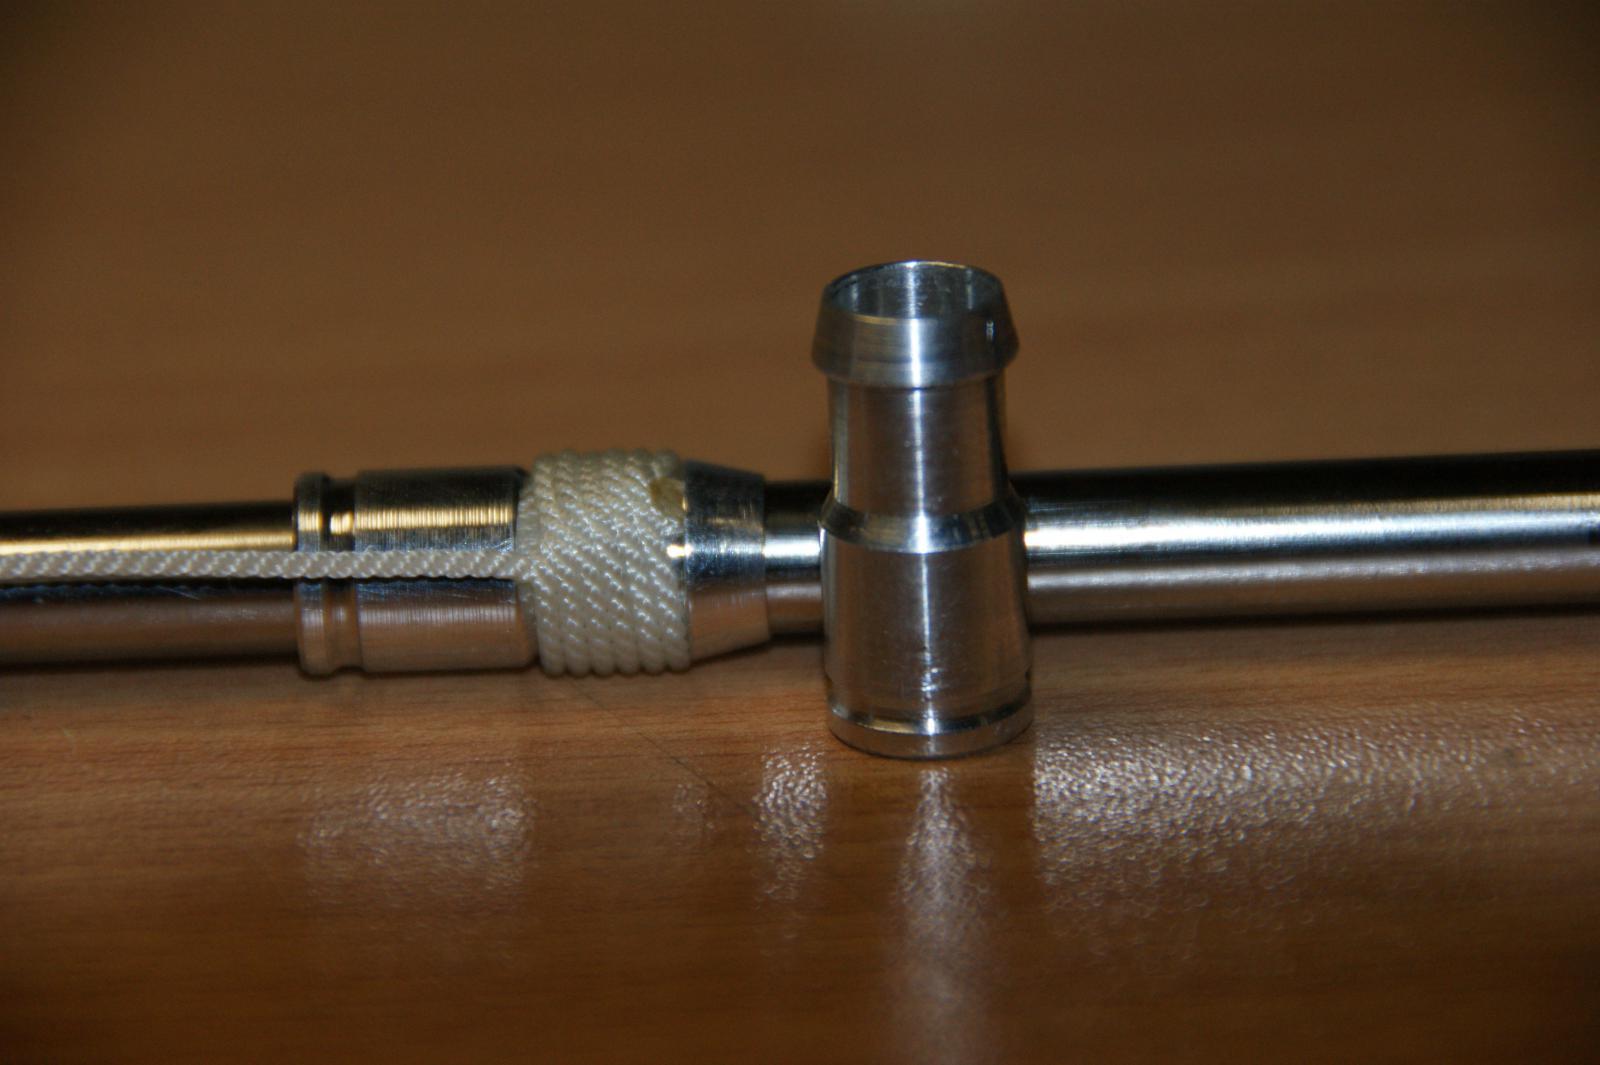 DSC06854.JPG